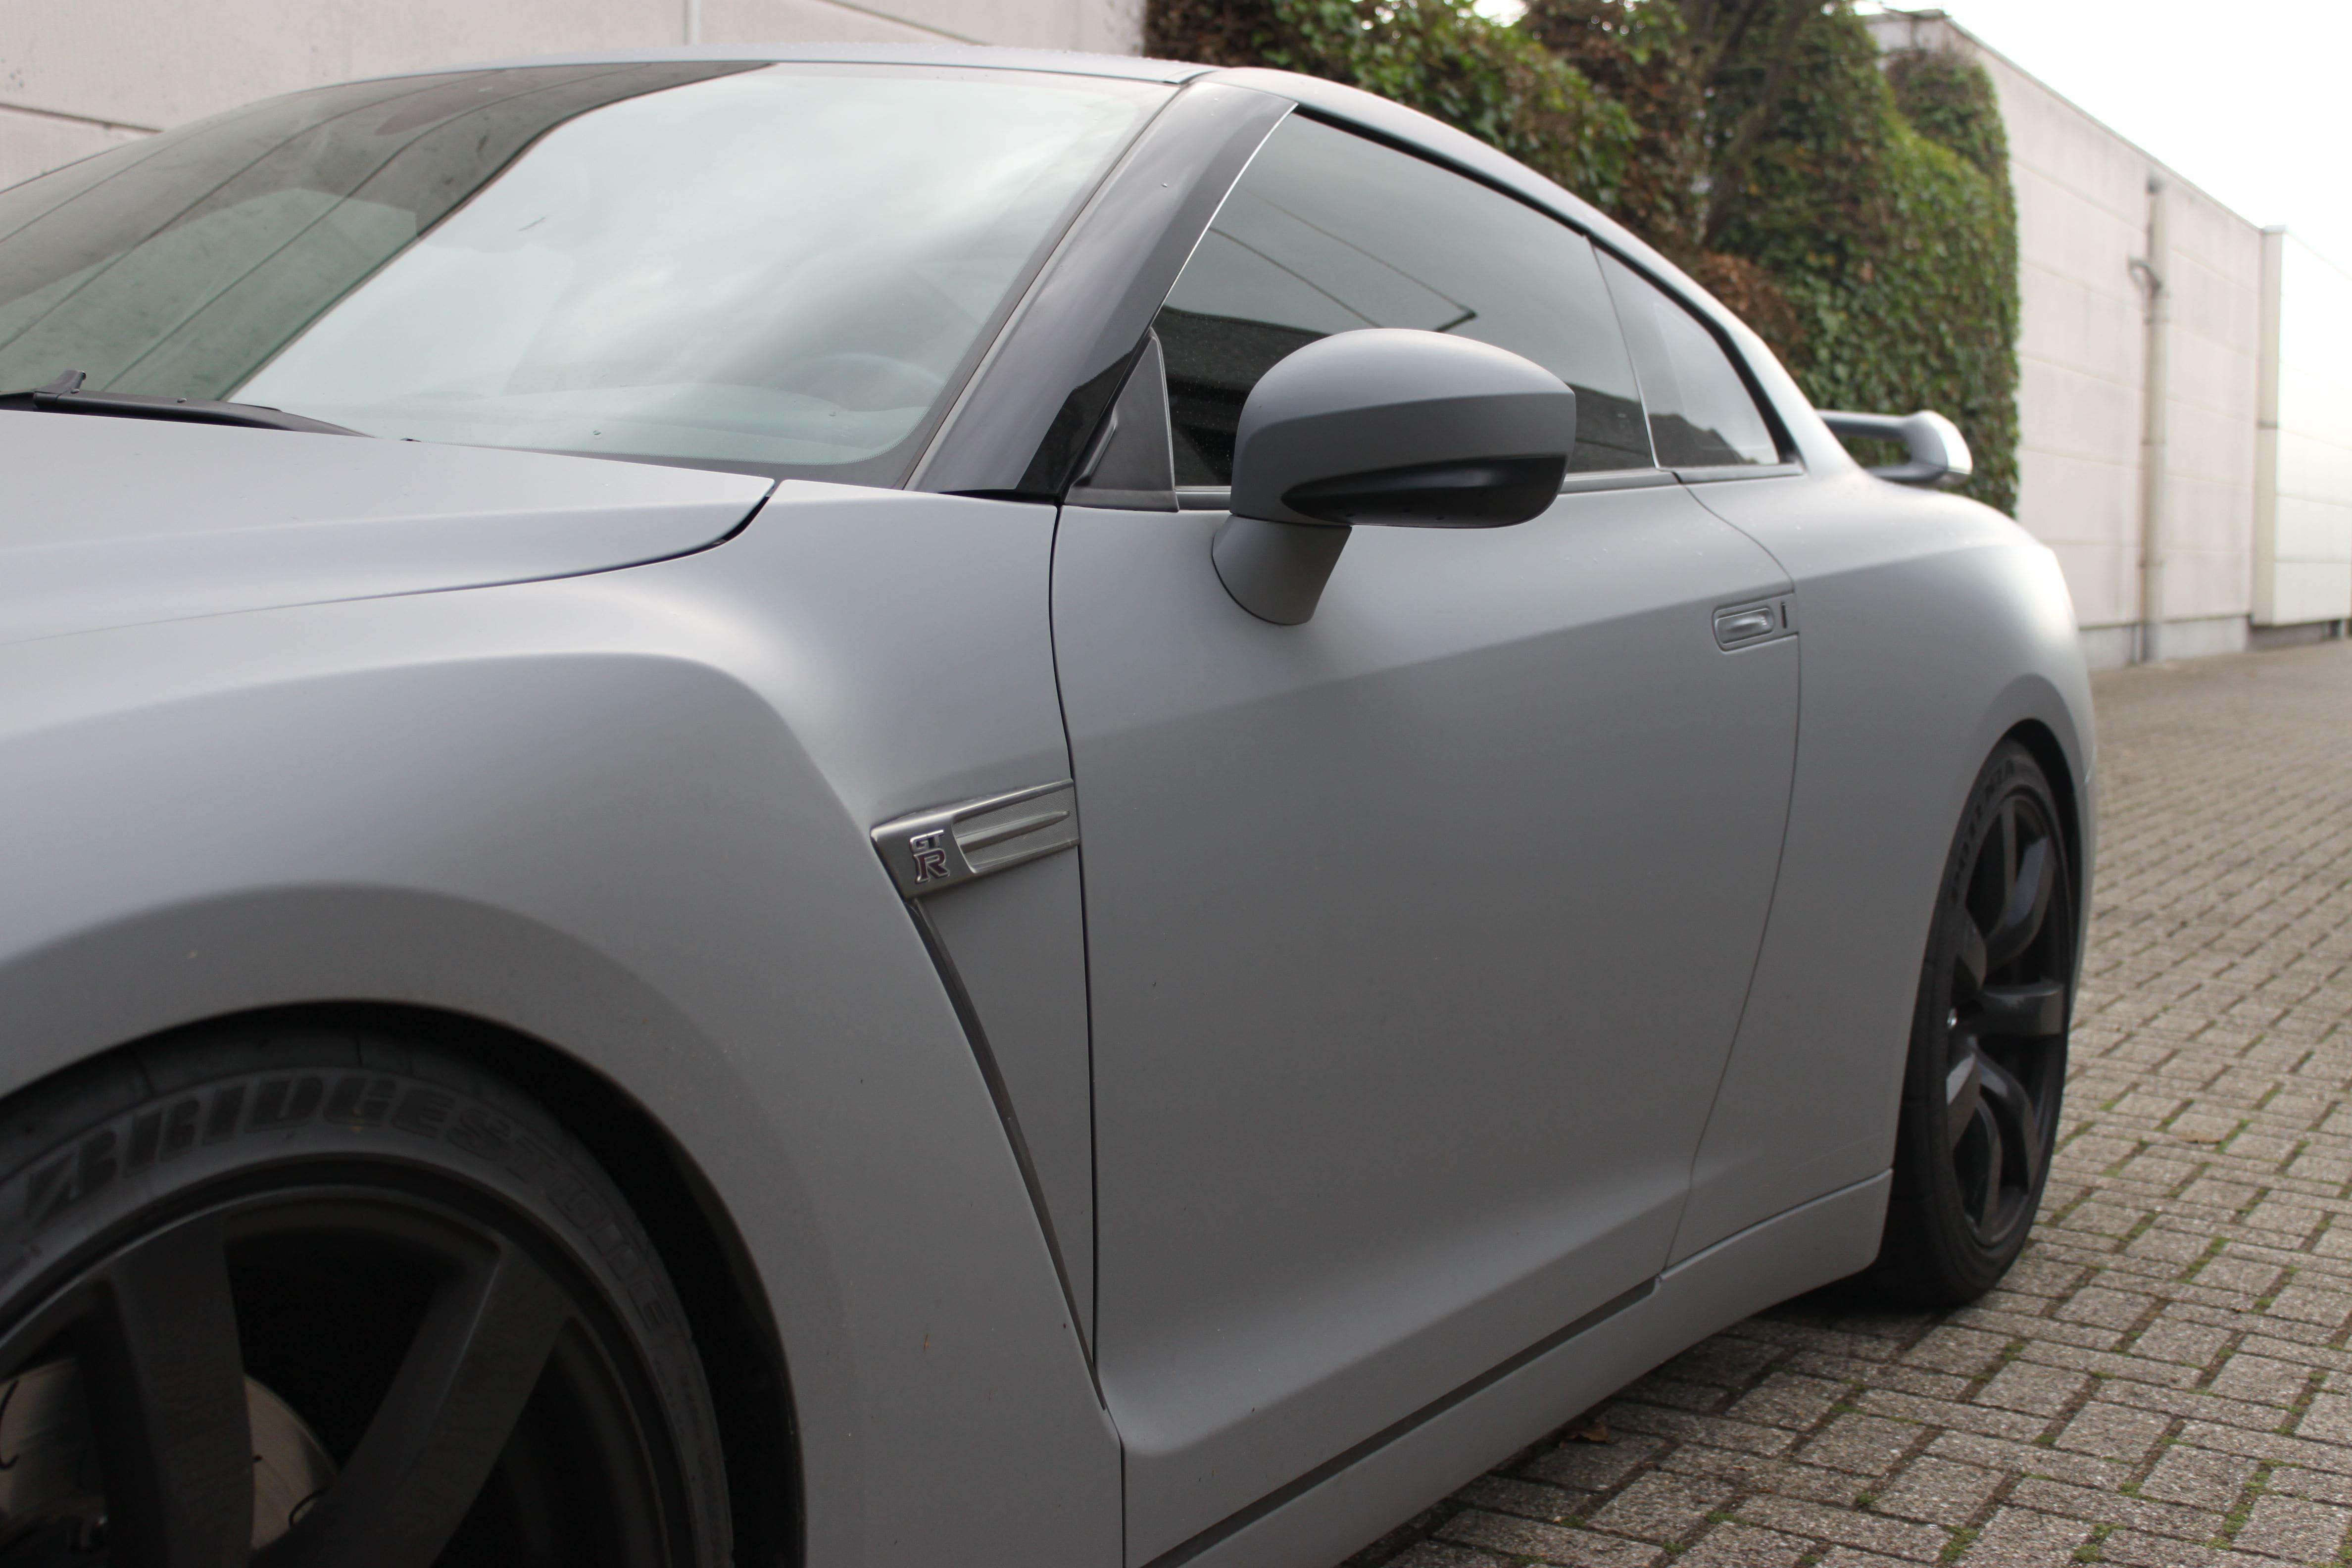 Nissan GT-R met Mat Grijze Wrap, Carwrapping door Wrapmyride.nu Foto-nr:6563, ©2021